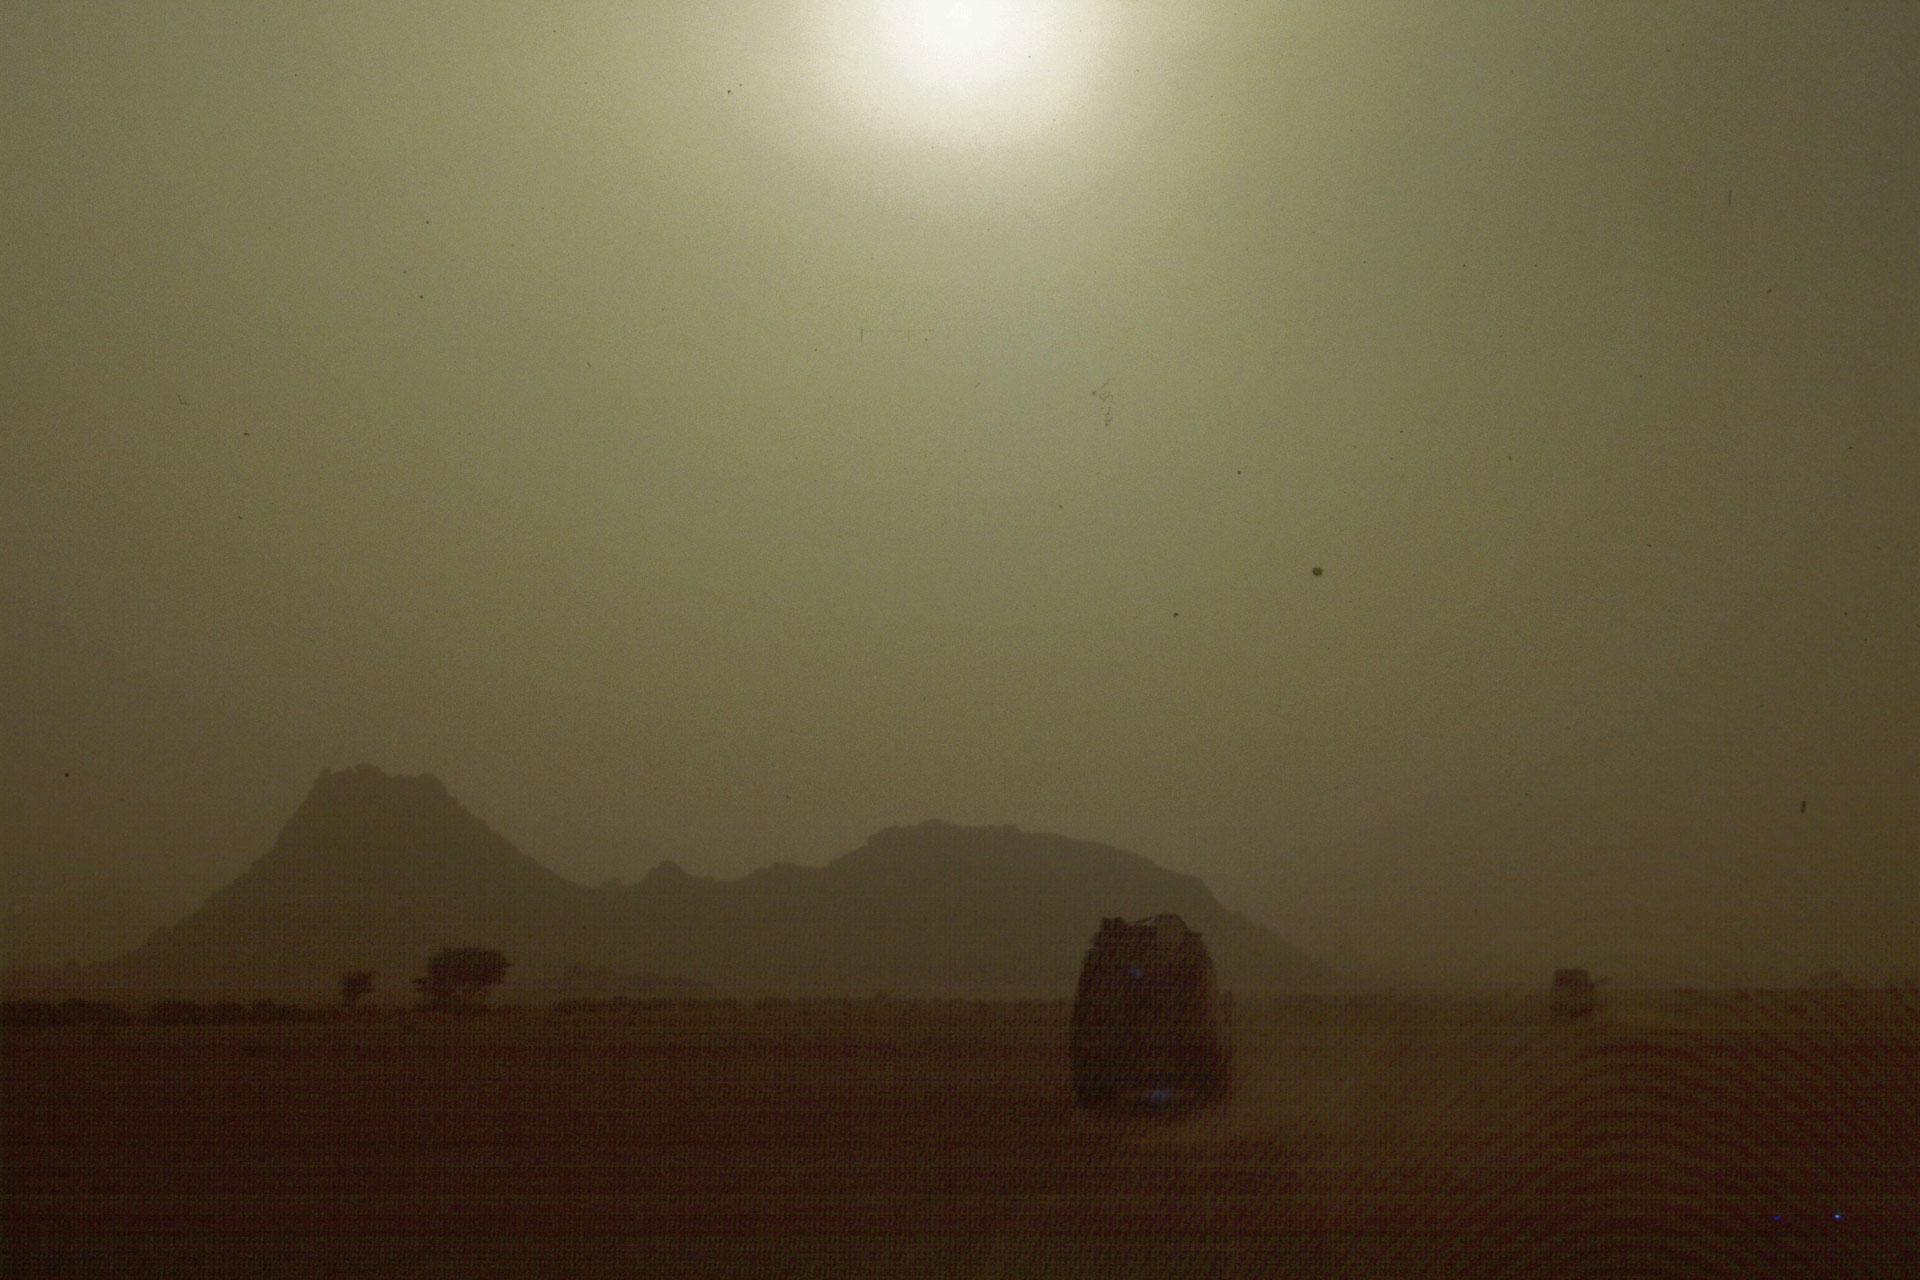 Abenteuerurlaub Sandsturm